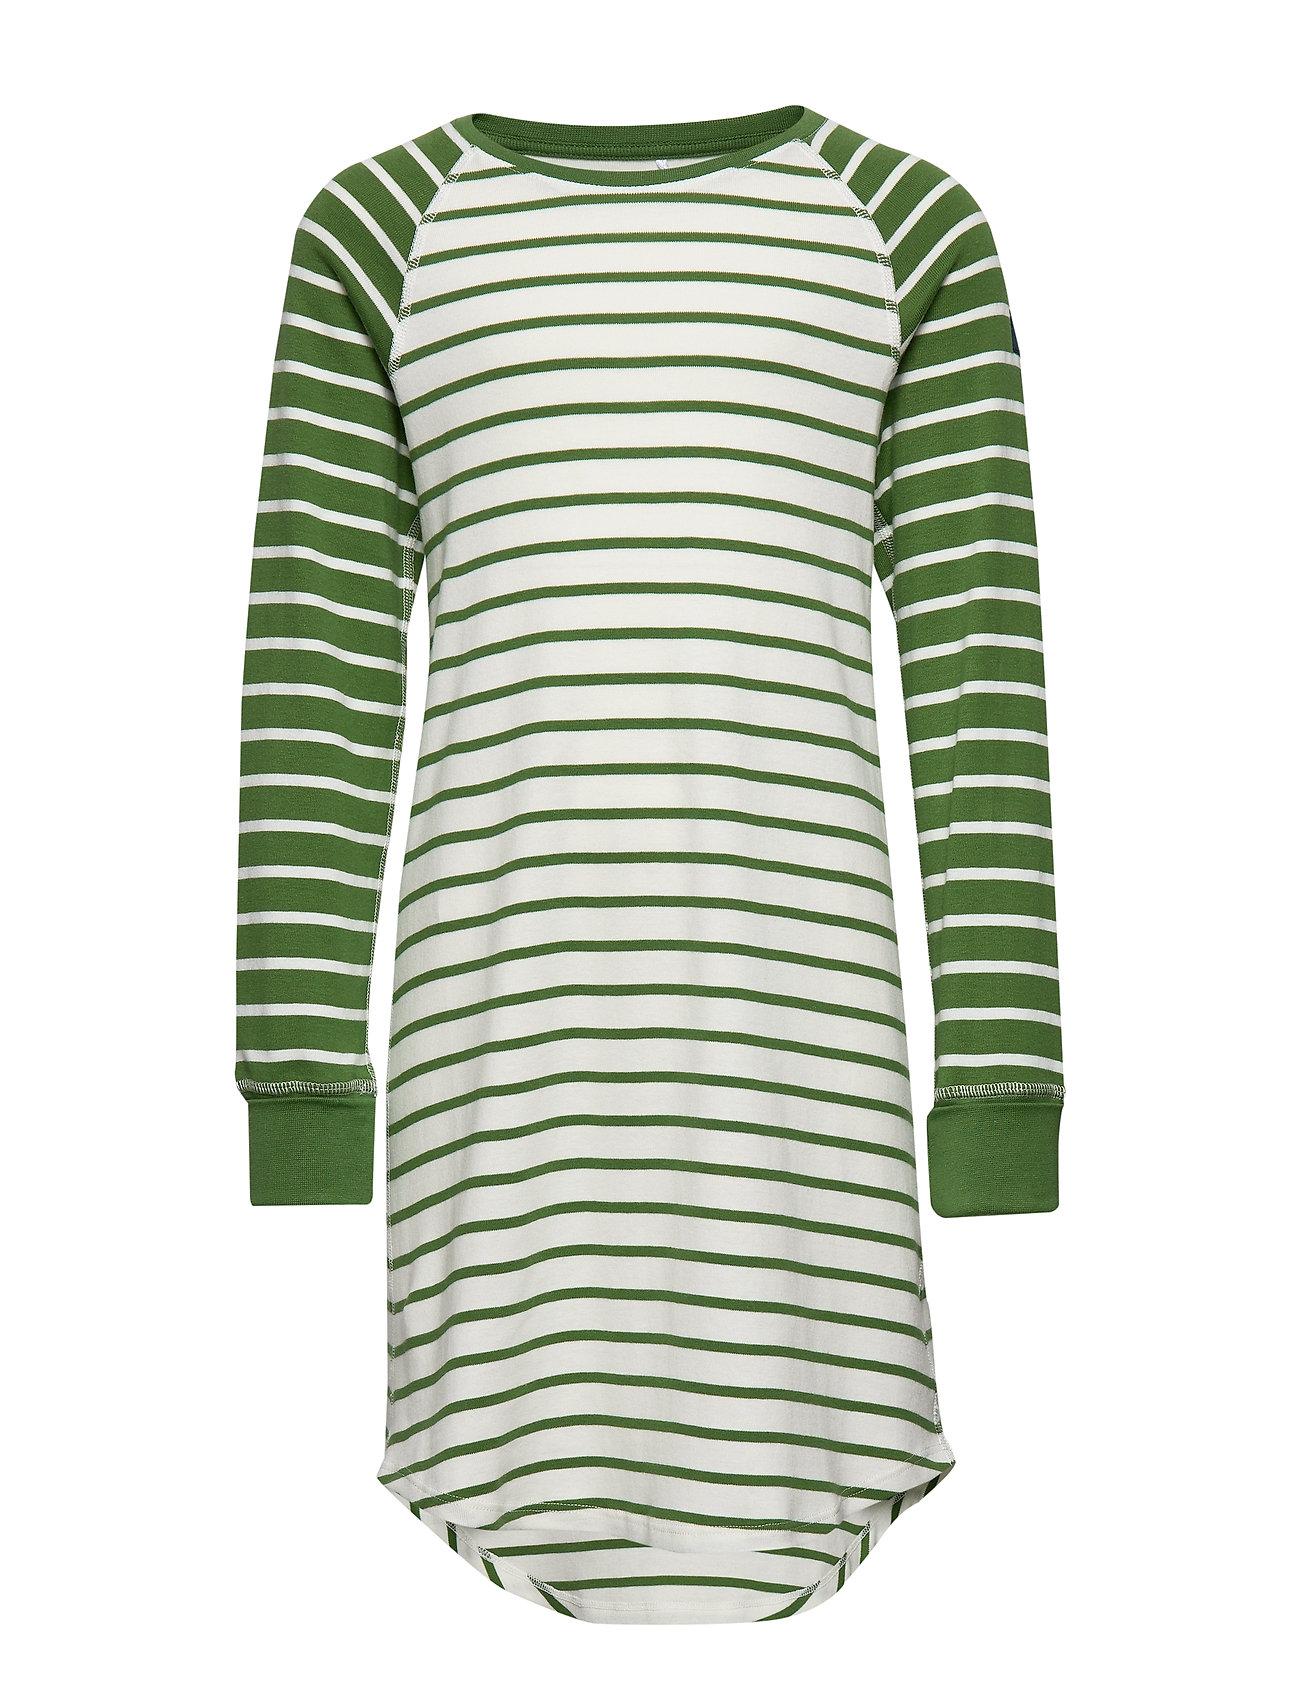 Polarn O. Pyret Nightdress l/s Striped School - WILLOW BOUGH